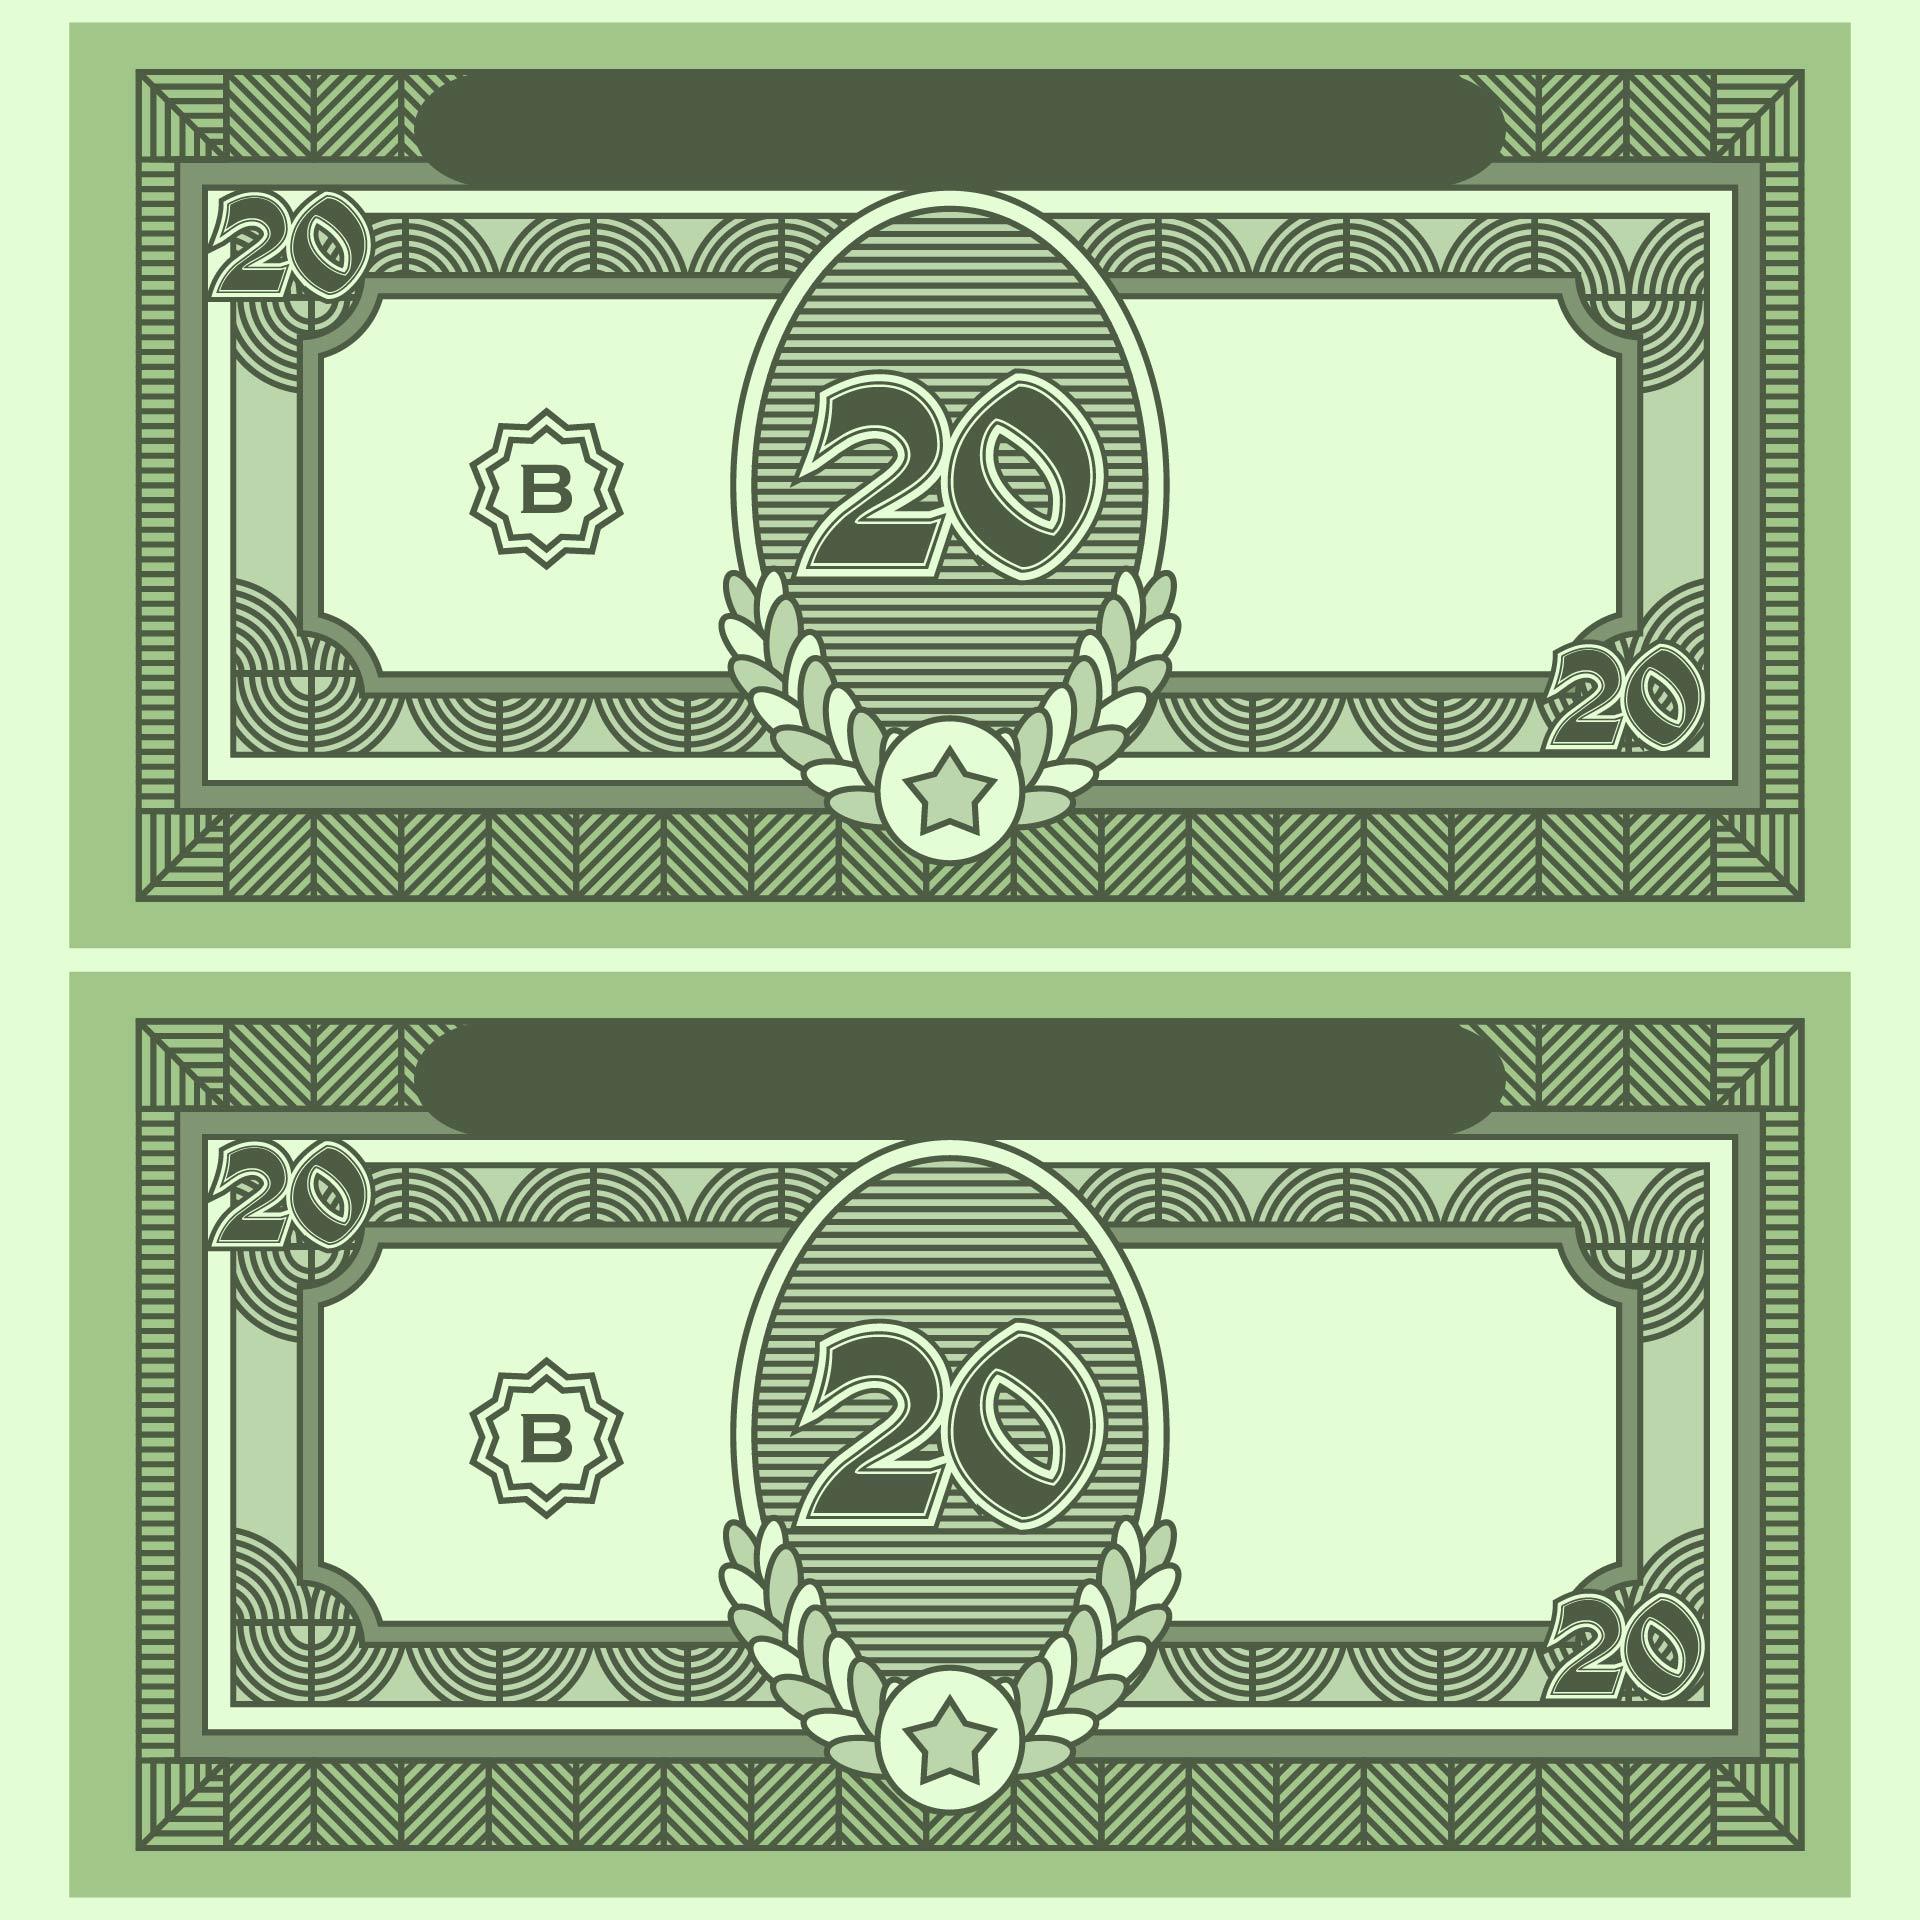 Printable Monopoly Play Money